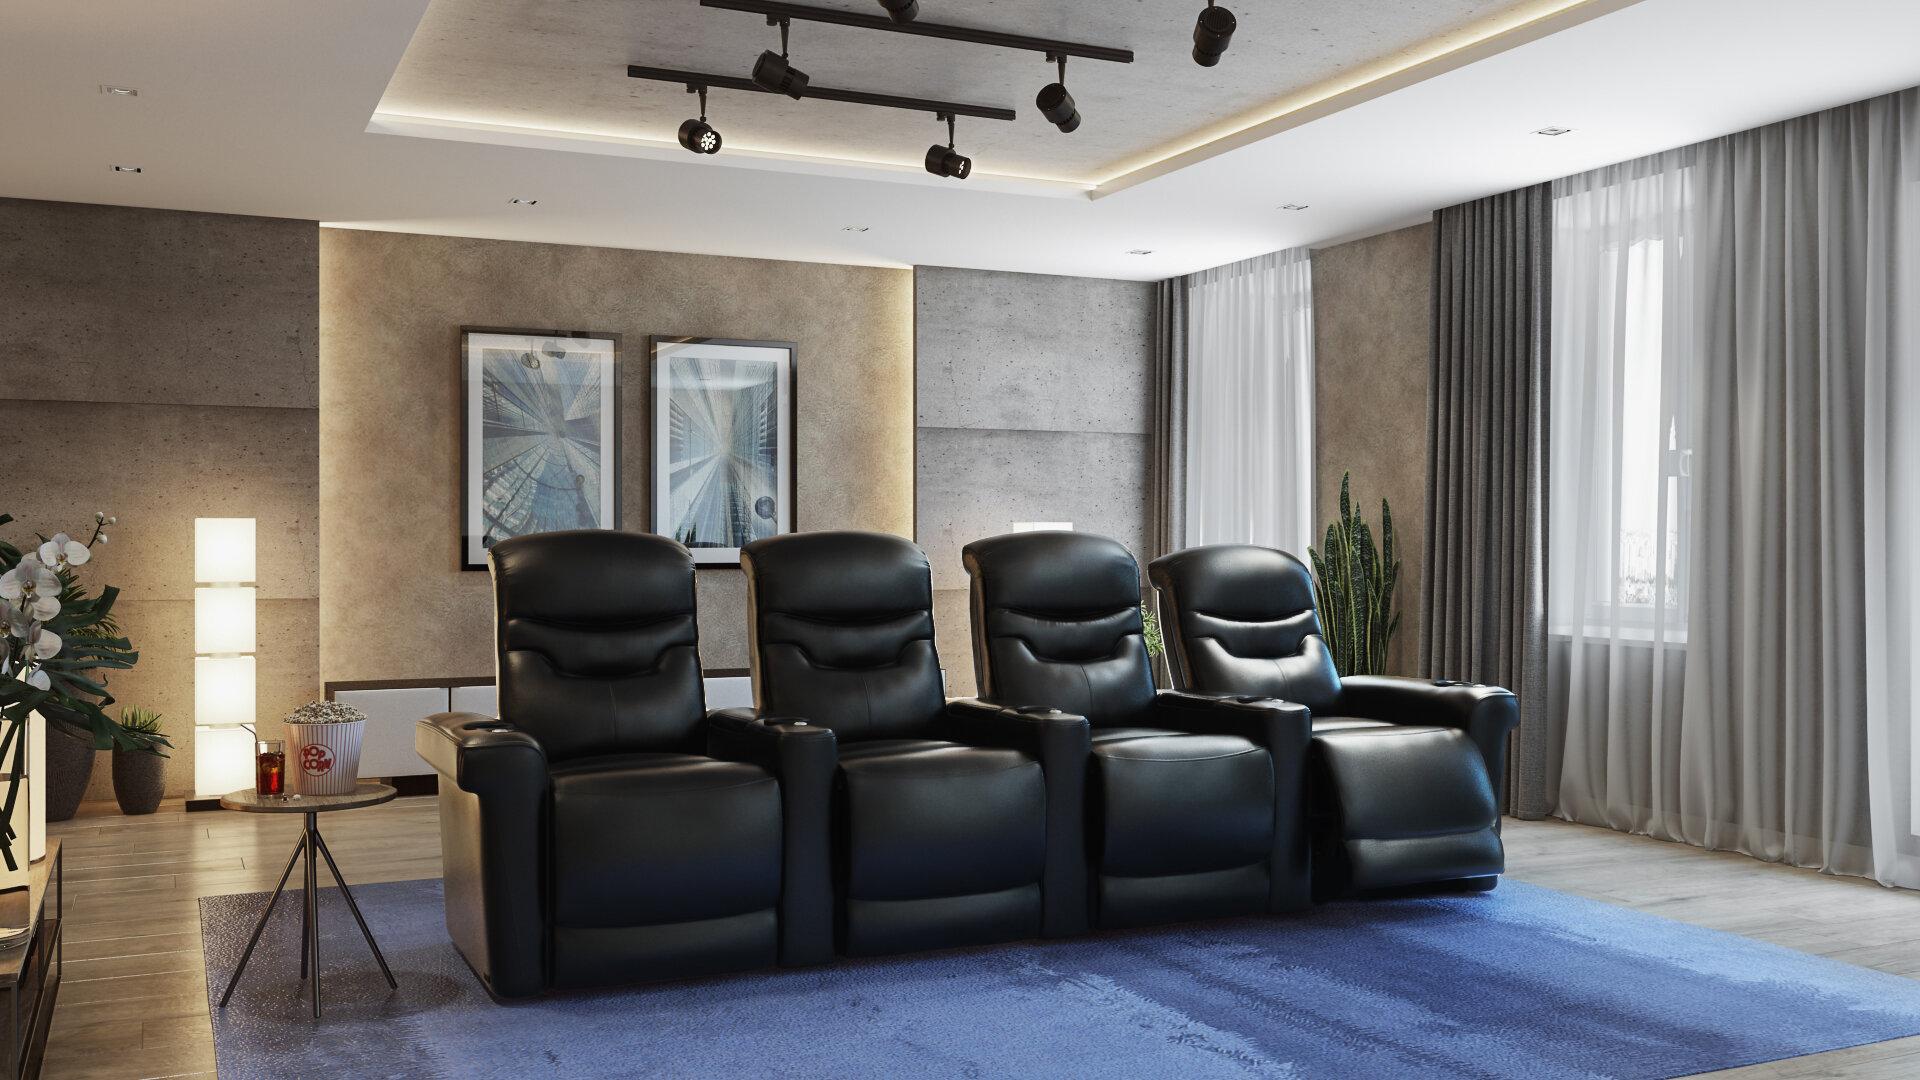 Orren Ellis Leather Home Theater Configurable Seating Reviews Wayfair